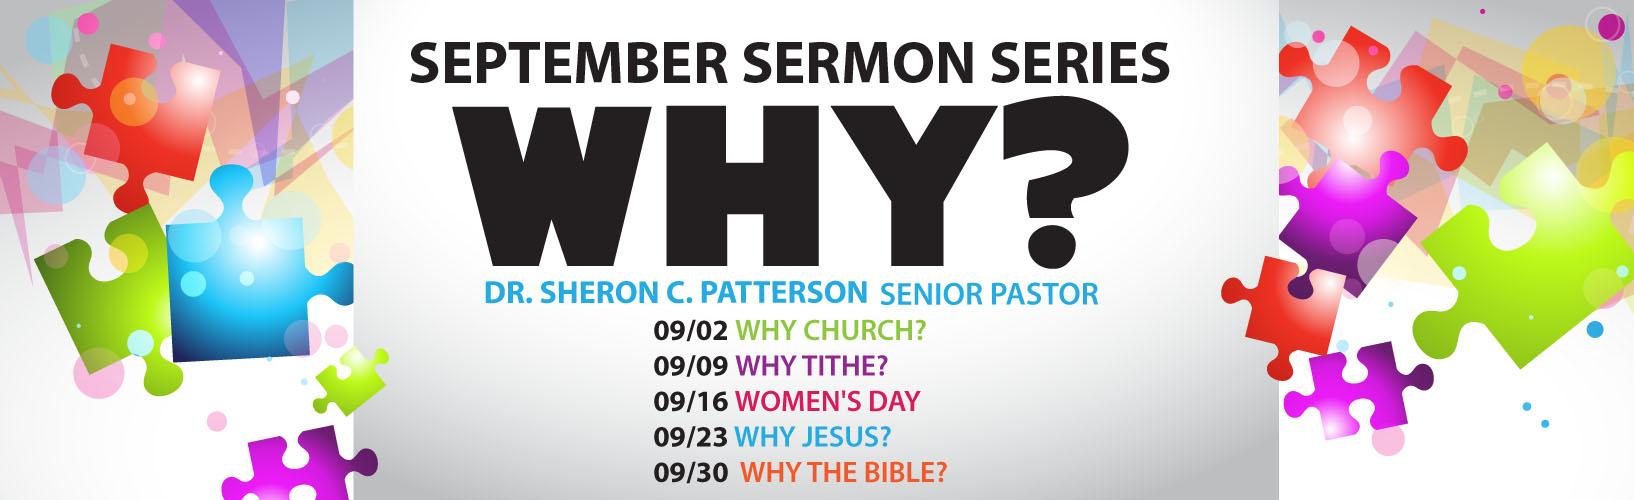 September 2018 Sermon Series